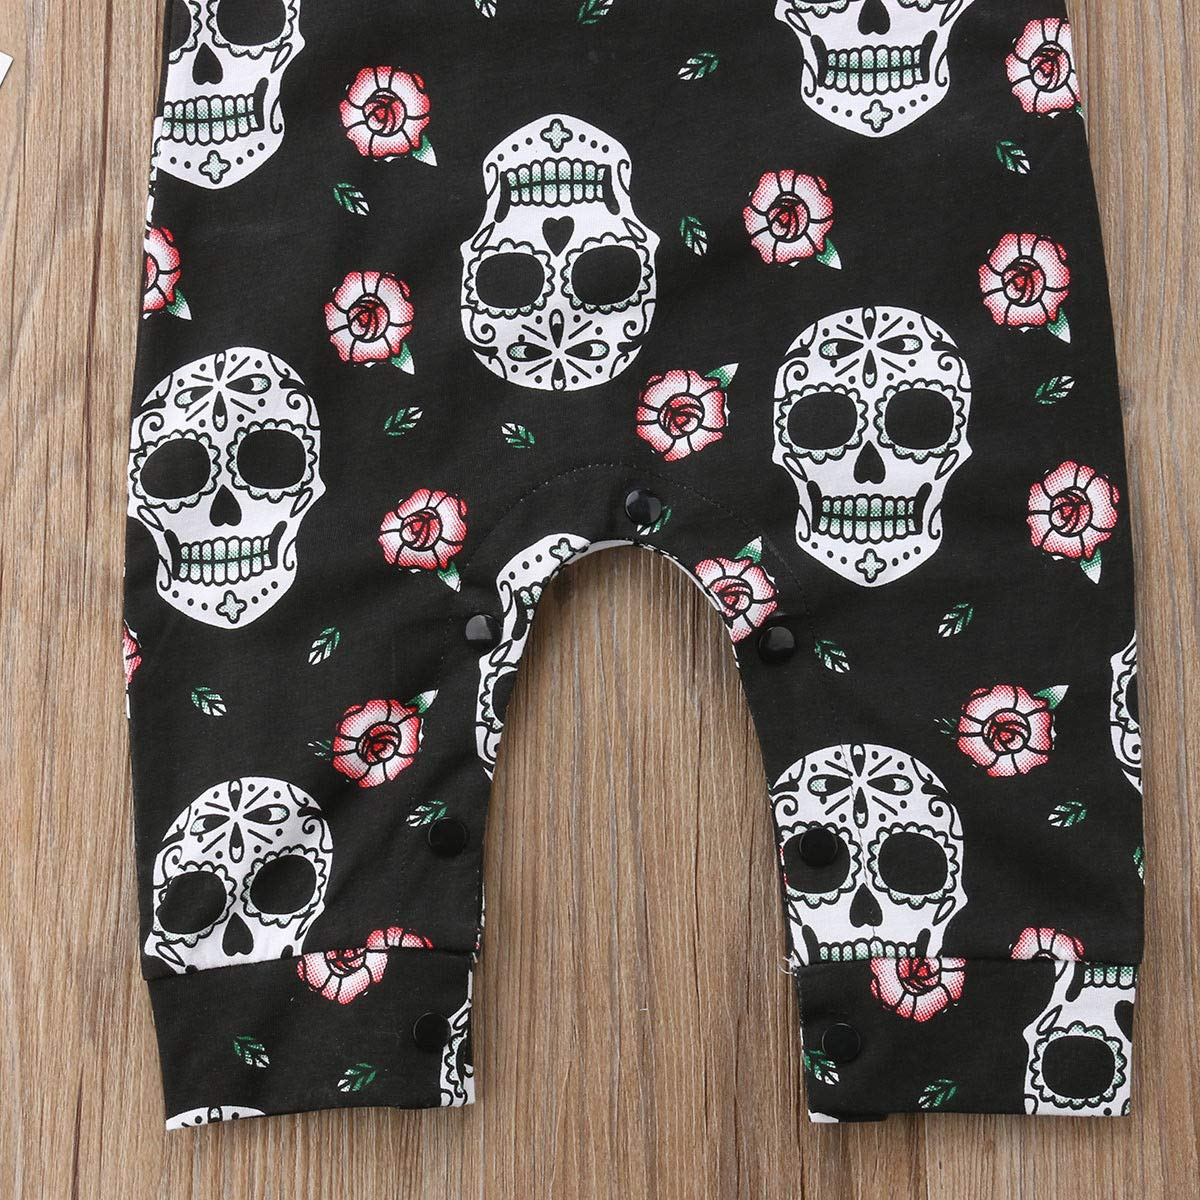 RS-FASHION Newborn Baby Girl Skull Romper Clothing Sleeveless Playsuit with Headband